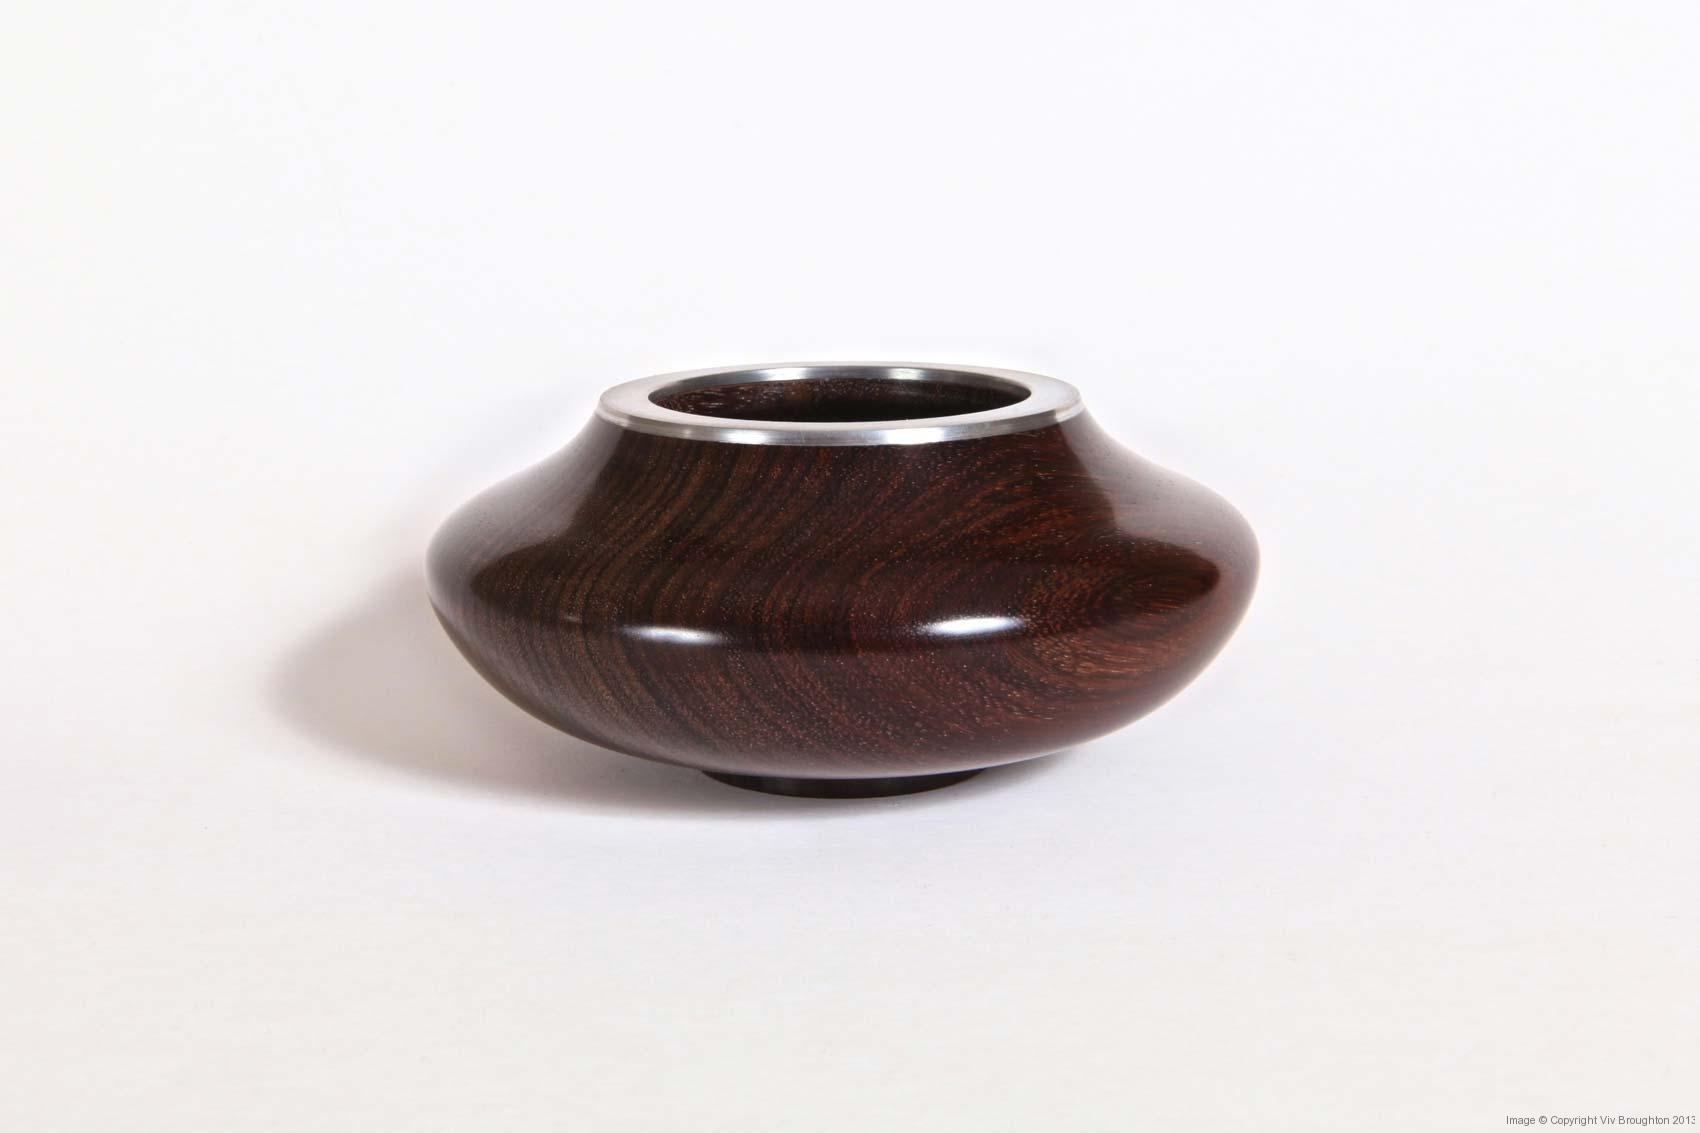 boccote-rosewood-stylised-bowl-with-pewter-rim